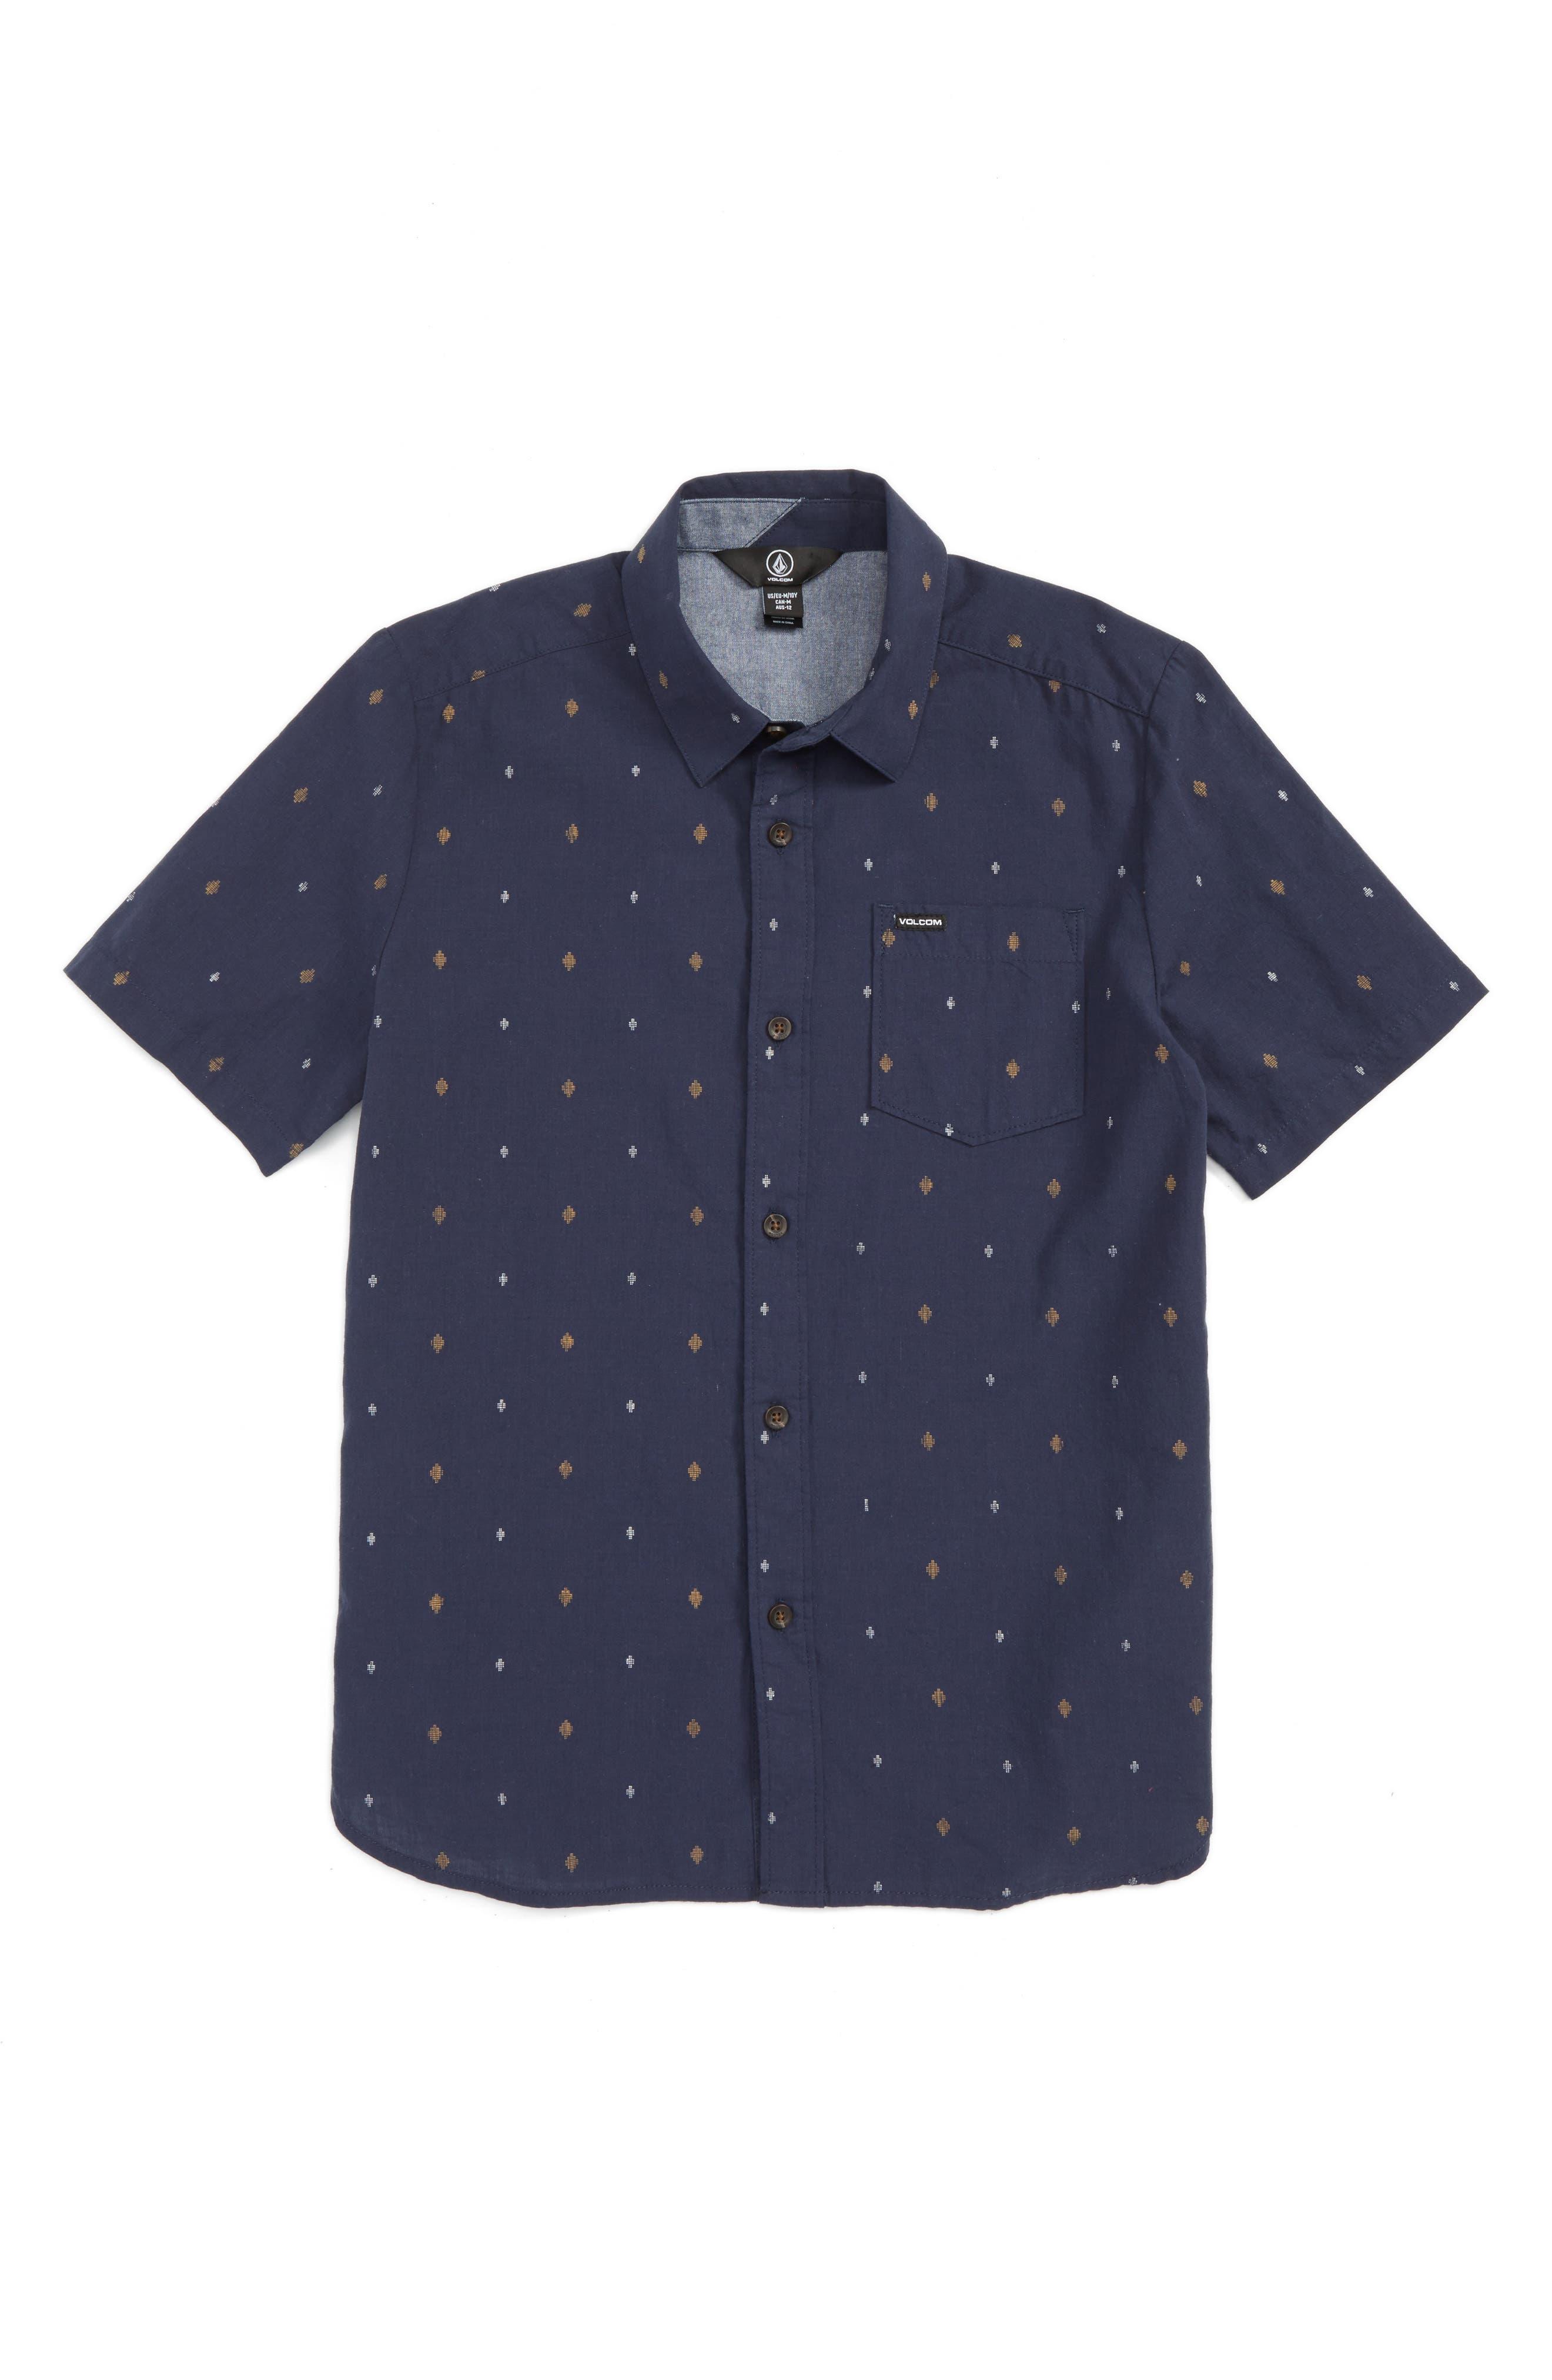 VOLCOM Interlude Print Woven Shirt